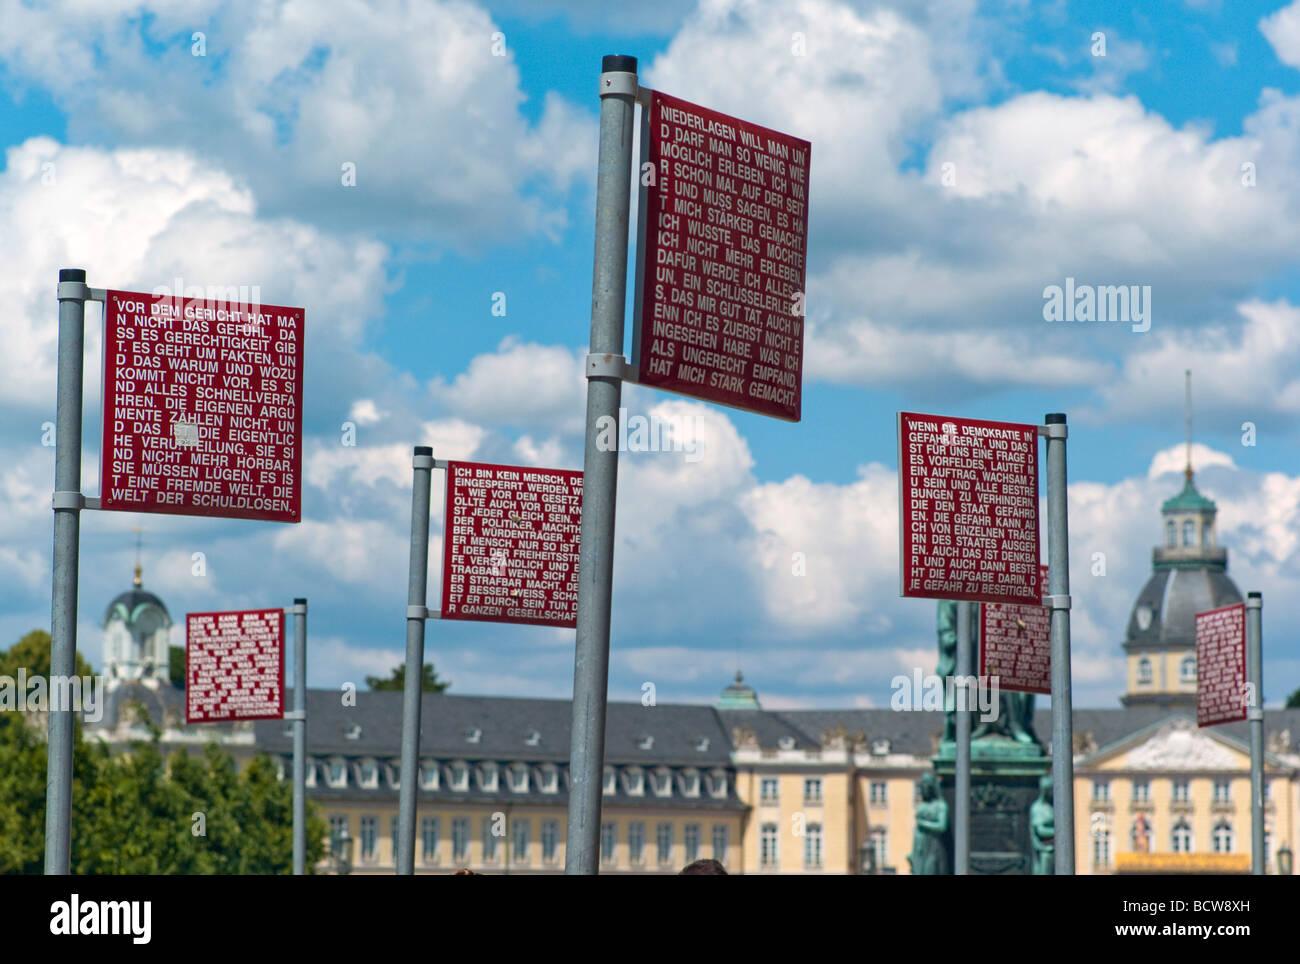 Platz der Grundrechte, Square of the fundamental rights, art work by Jochen Gerz, Karlsruhe, Baden-Wuerttemberg, - Stock Image